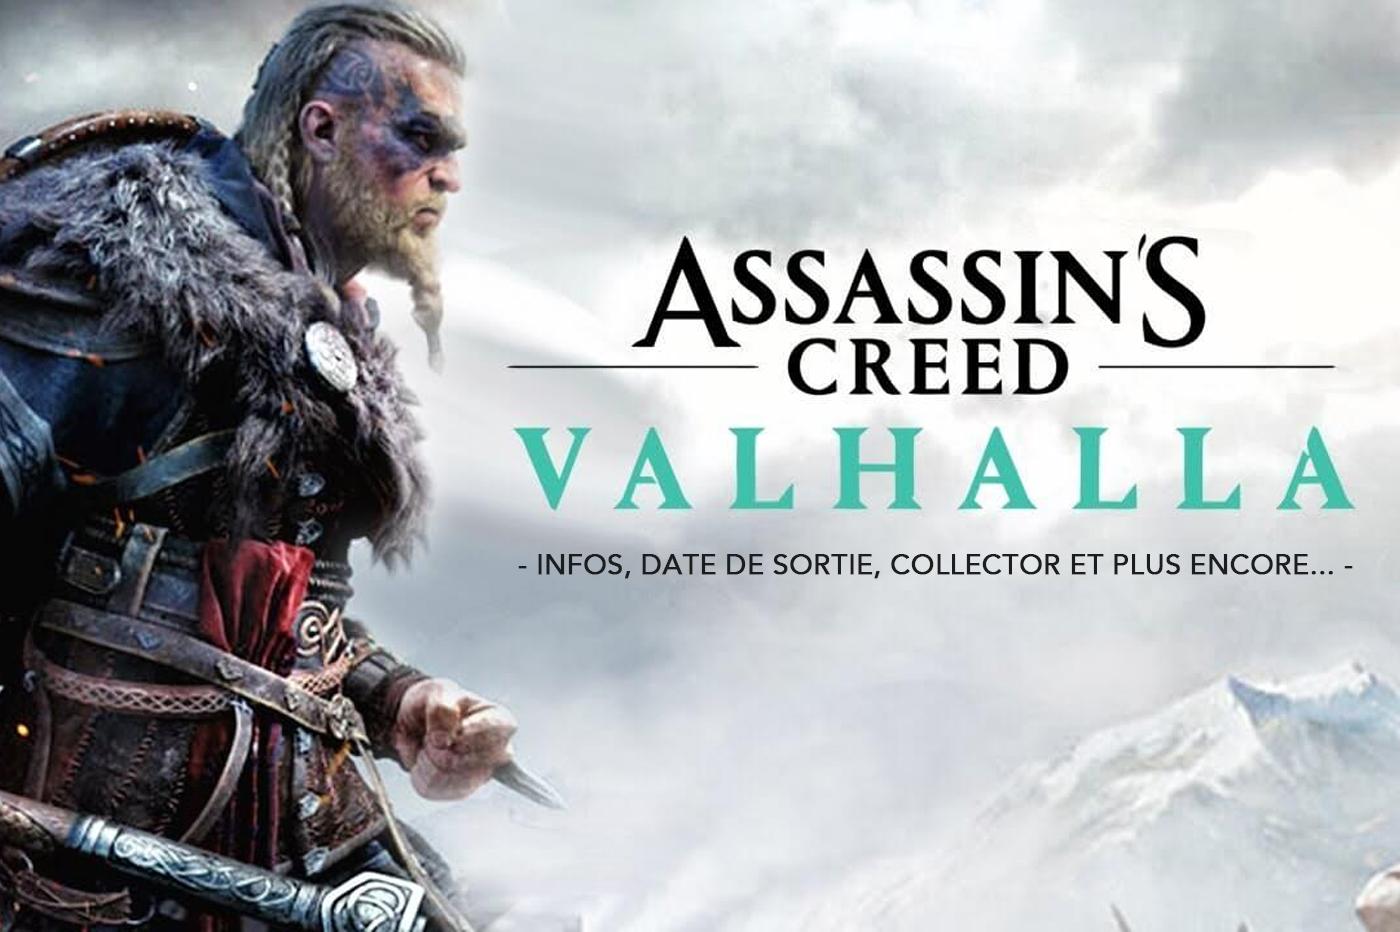 Assassin's Creed Valhalla - Infos, date de sortie, Collector et plus encore